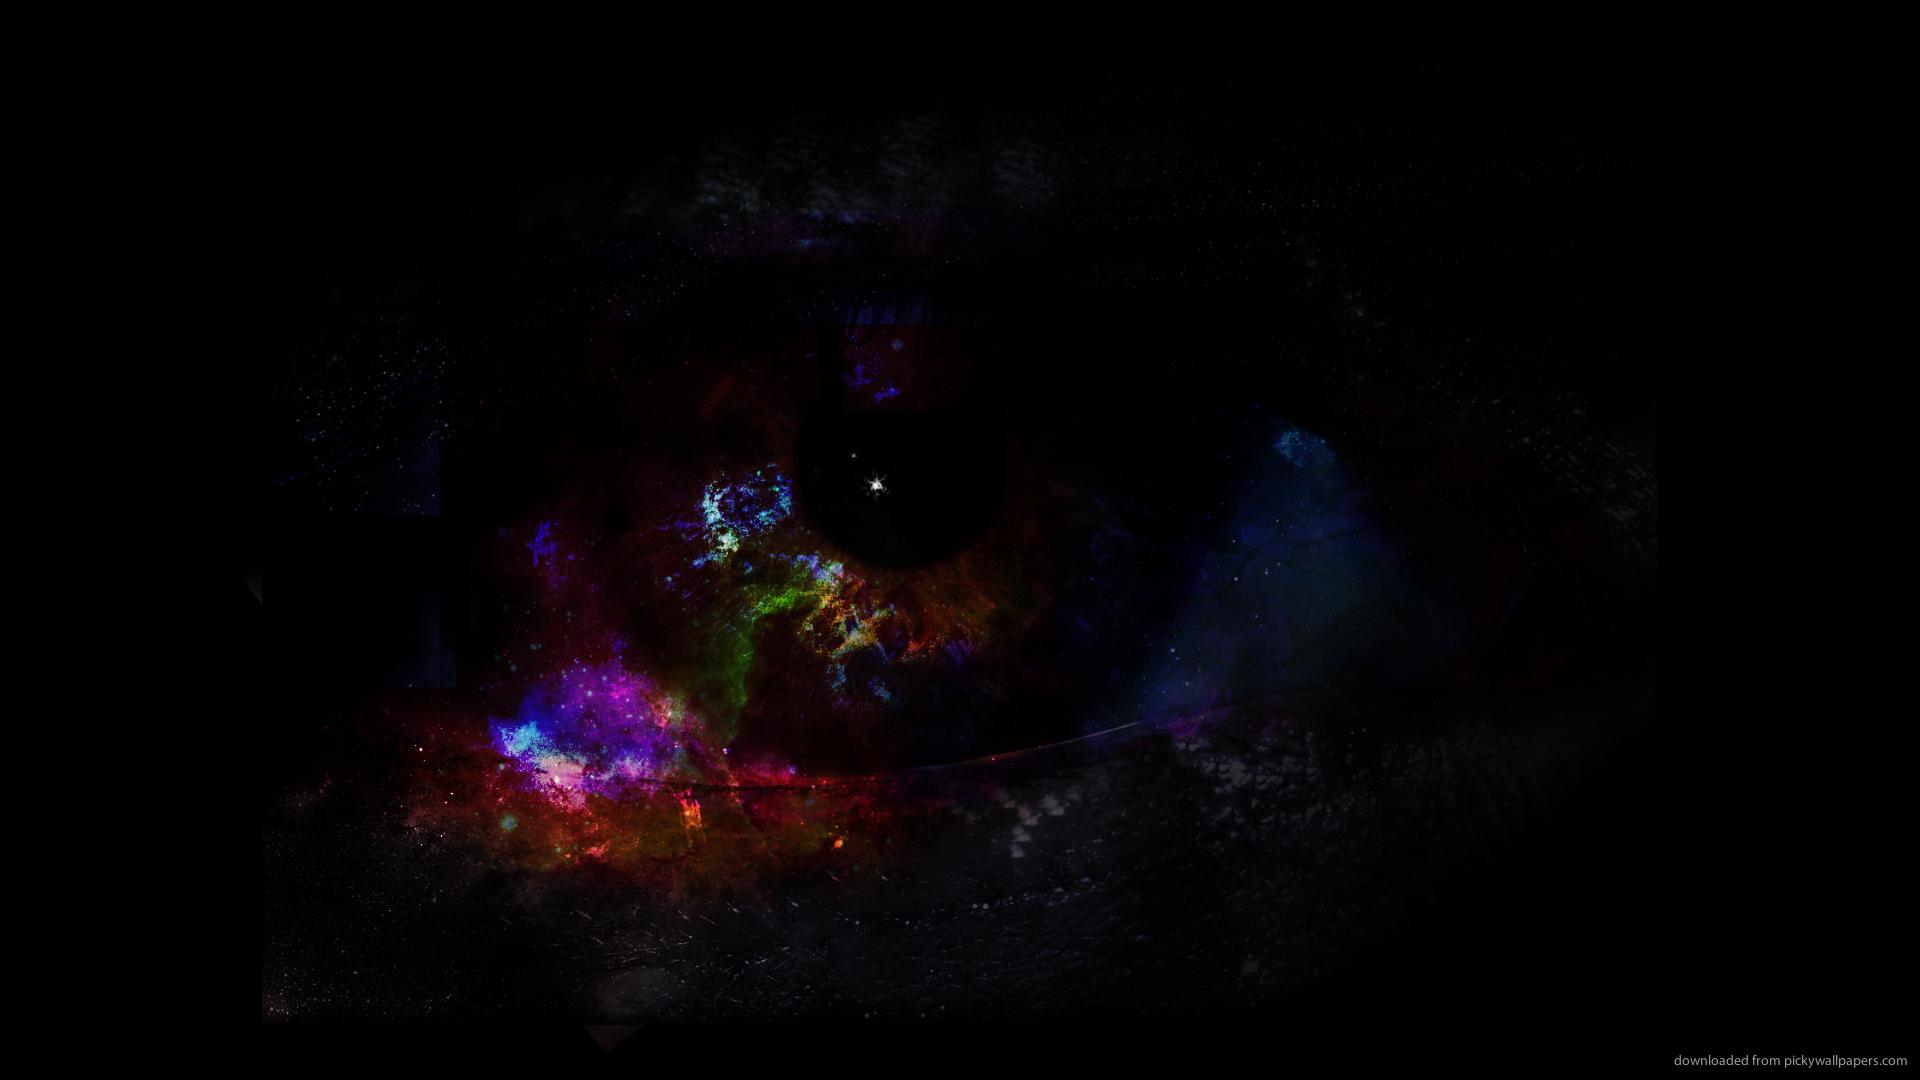 HD Abstract Dark Eye Wallpaper